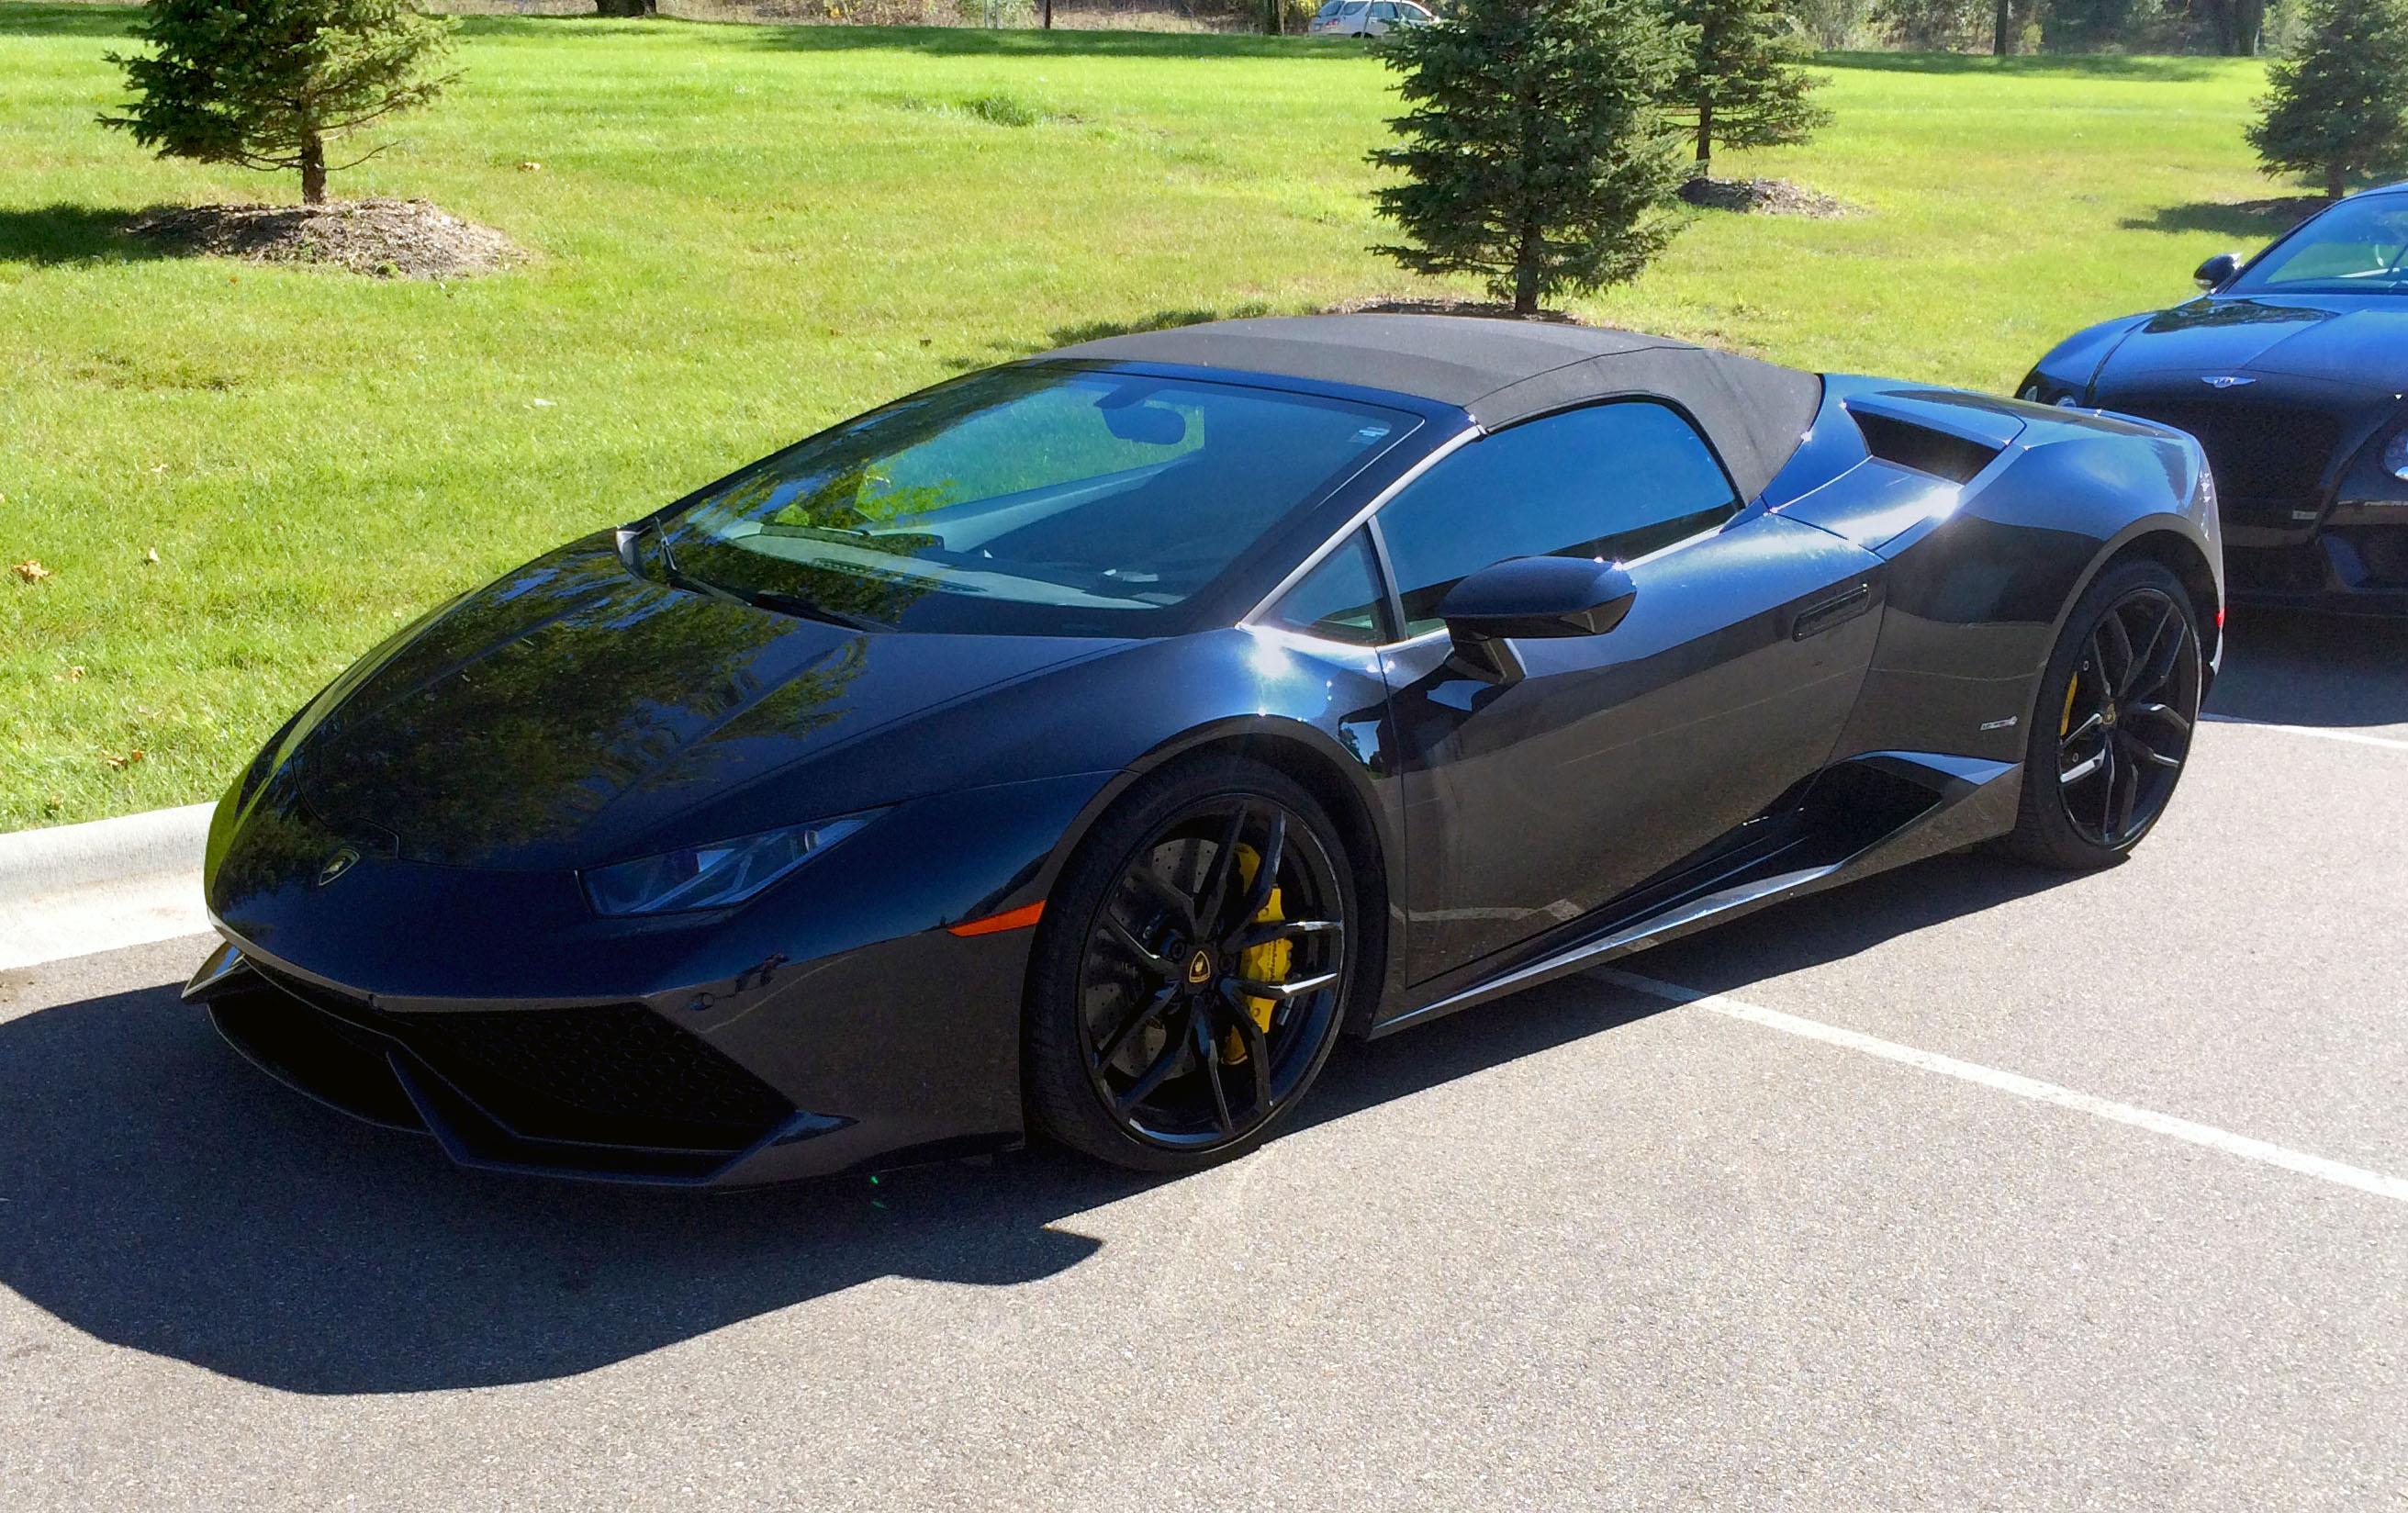 Driving 5 Dream Cars In 1 Day! Part 4 Of 6 – Lamborghini Huracán